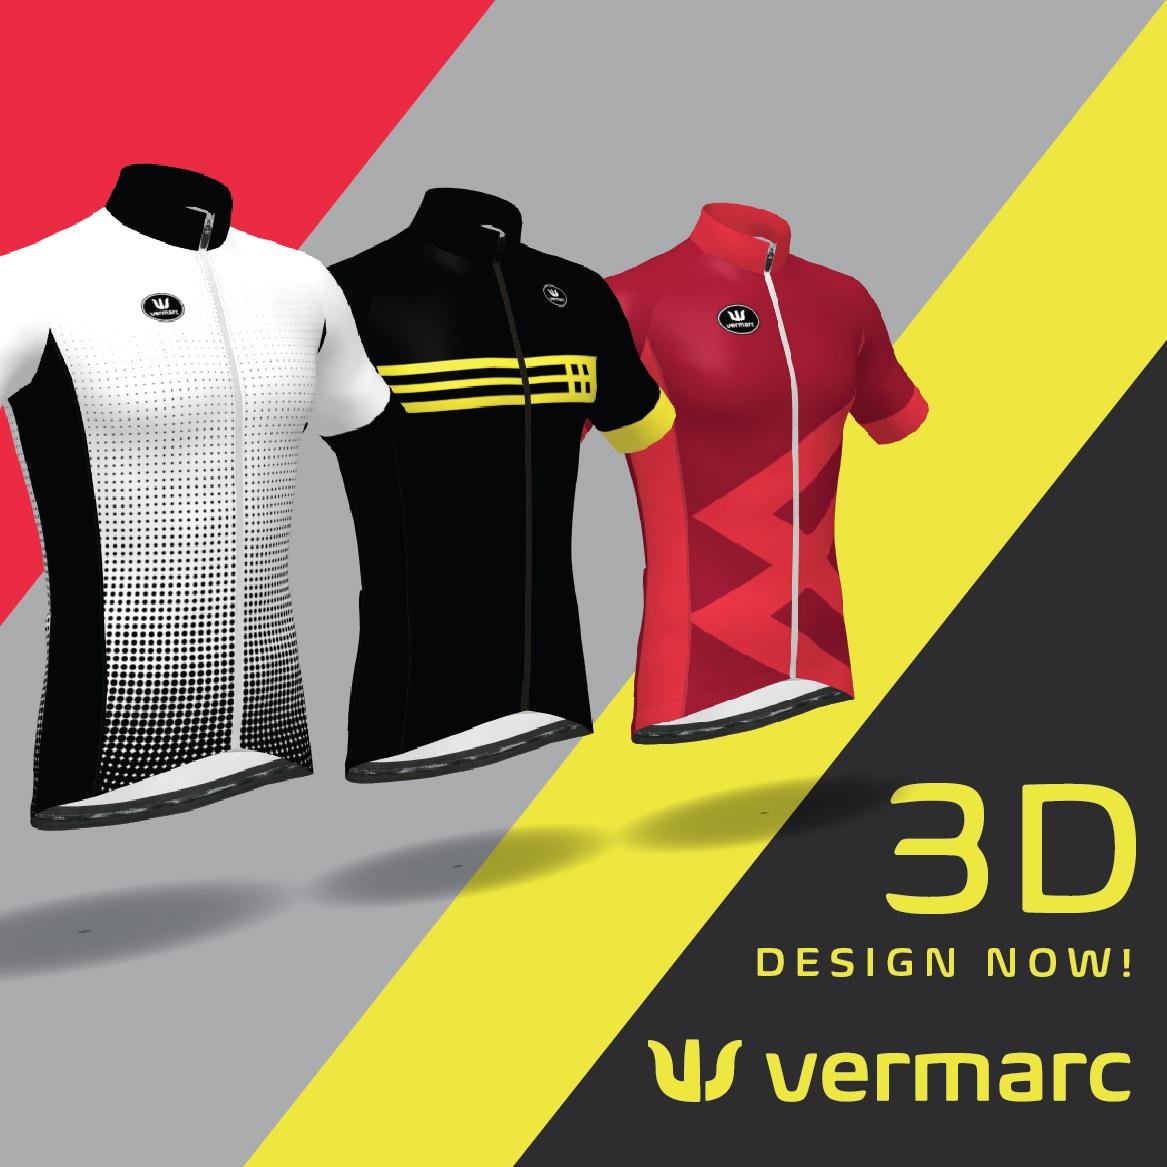 vermarc.mybrikl.com/nl/jersey-design-template